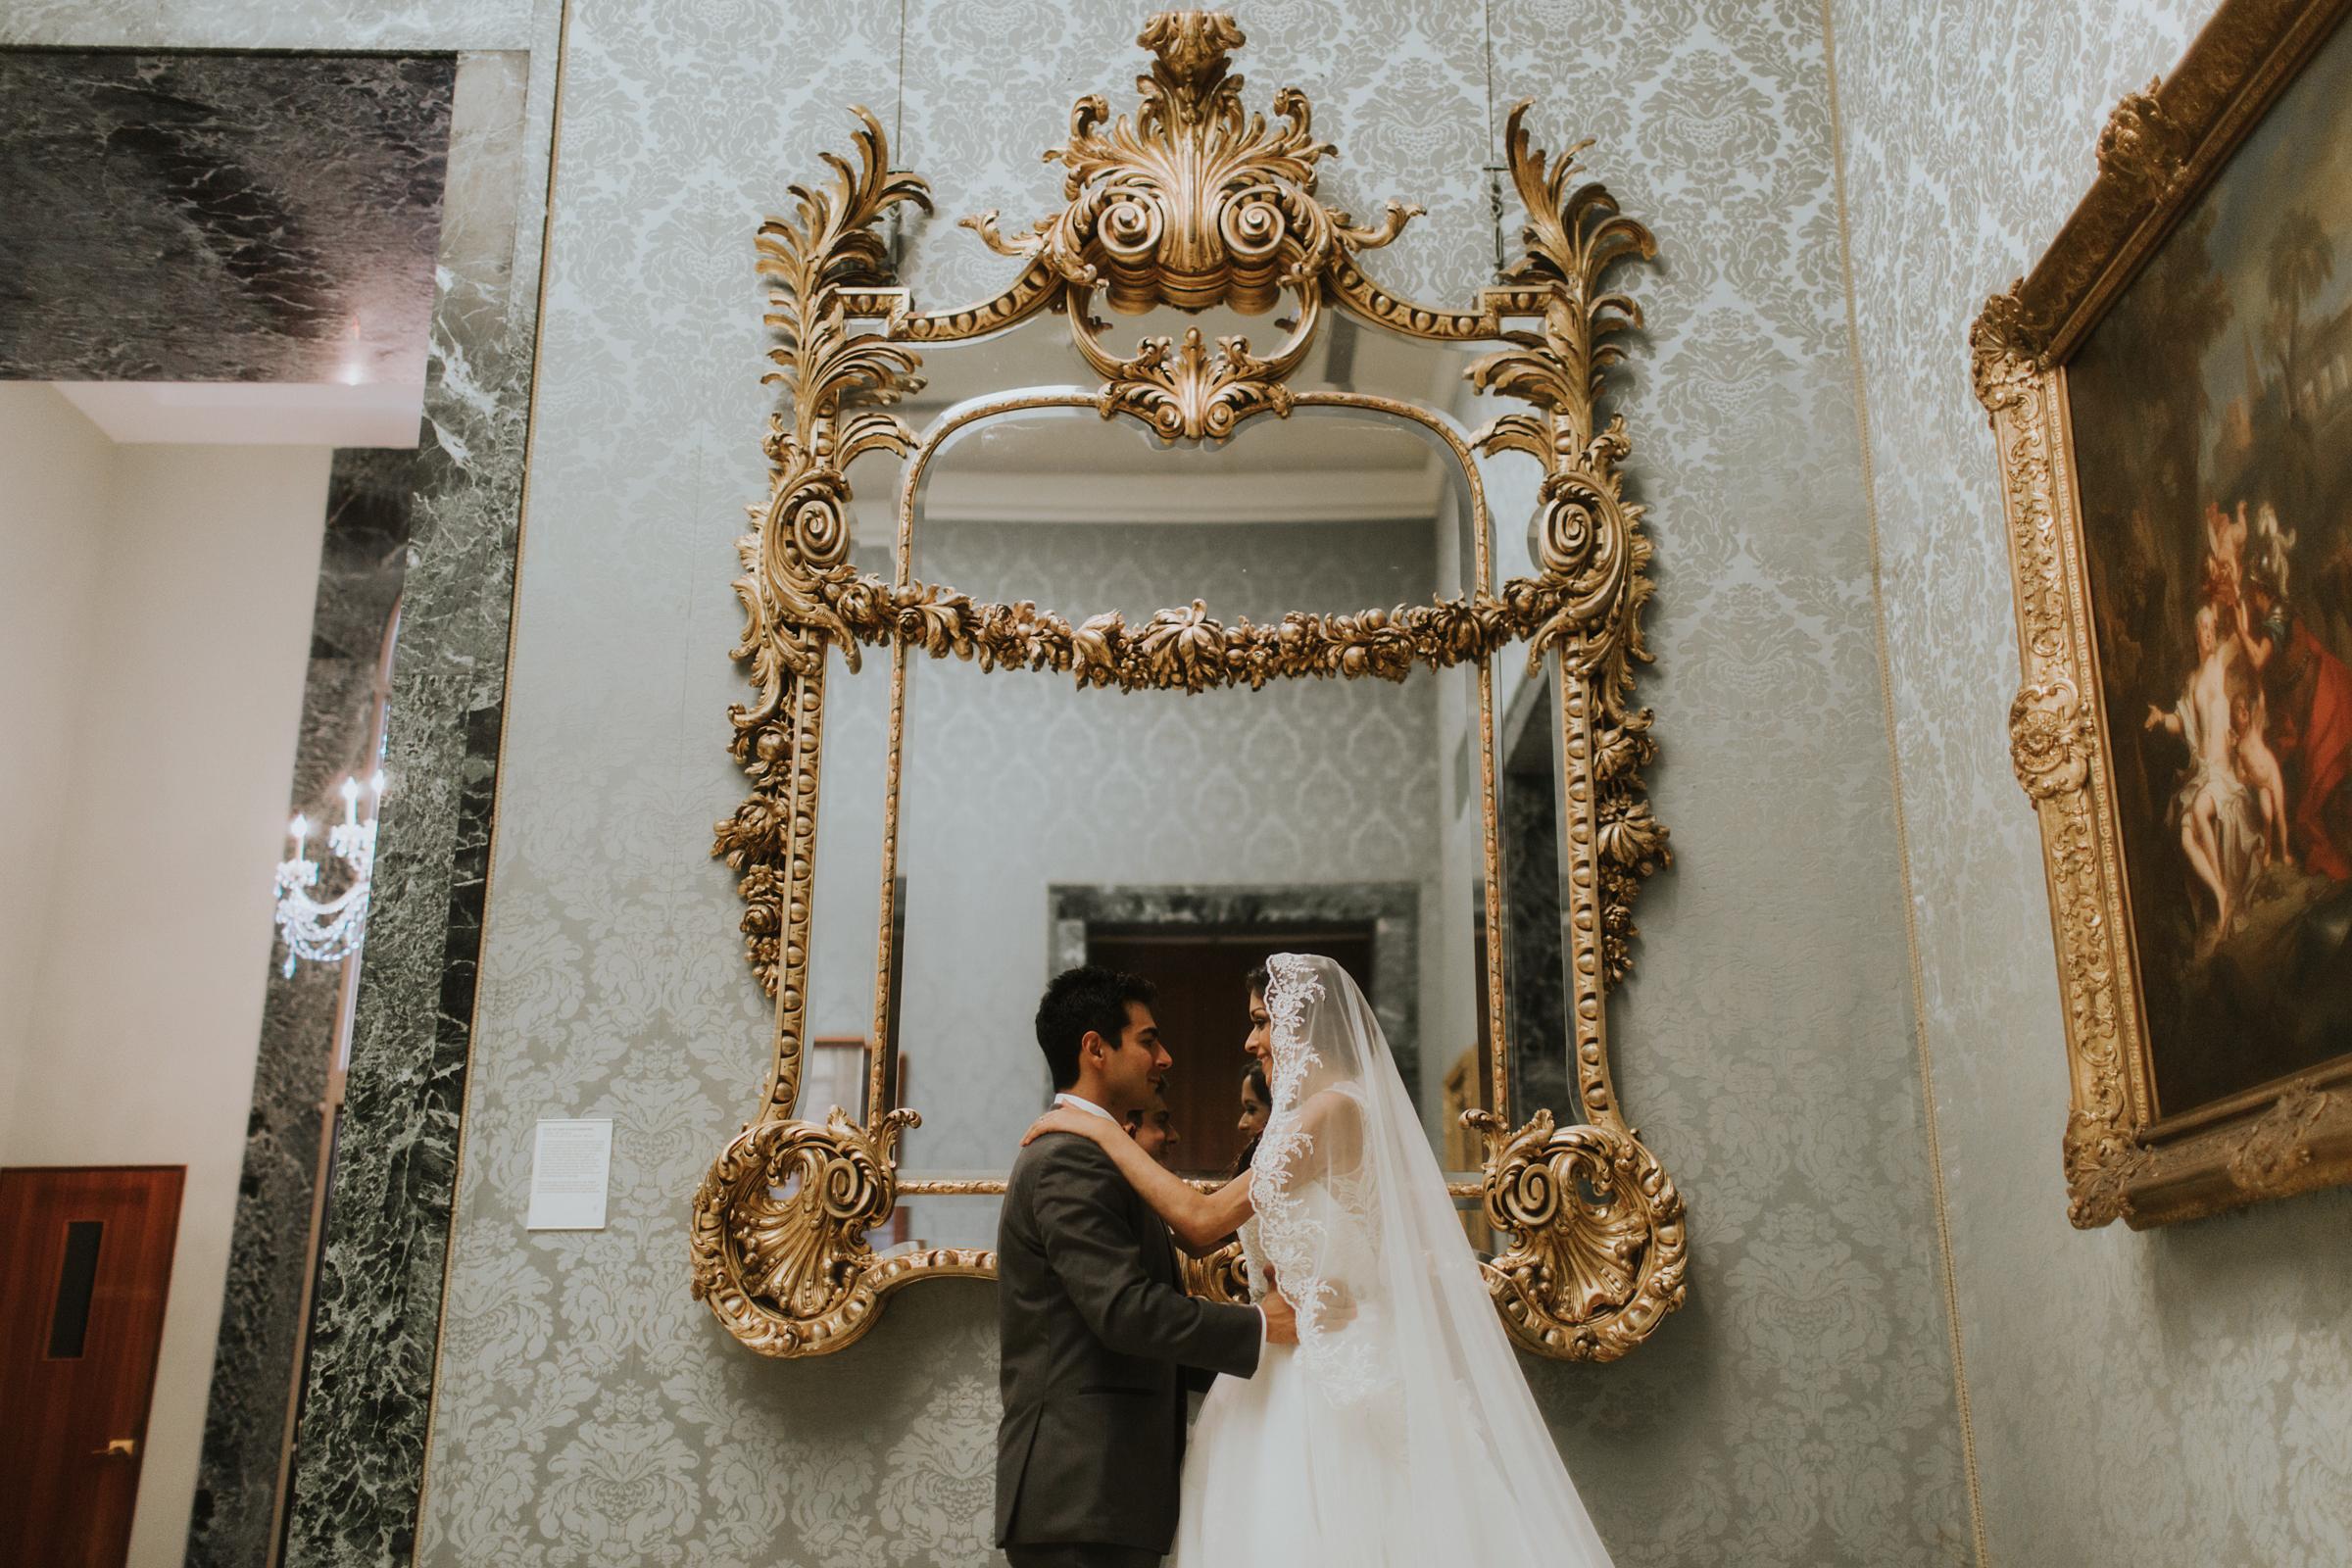 wedding day | MFA St Pete | Vanessa Boy Photography | vanessaboy.com-249.com |final.jpg